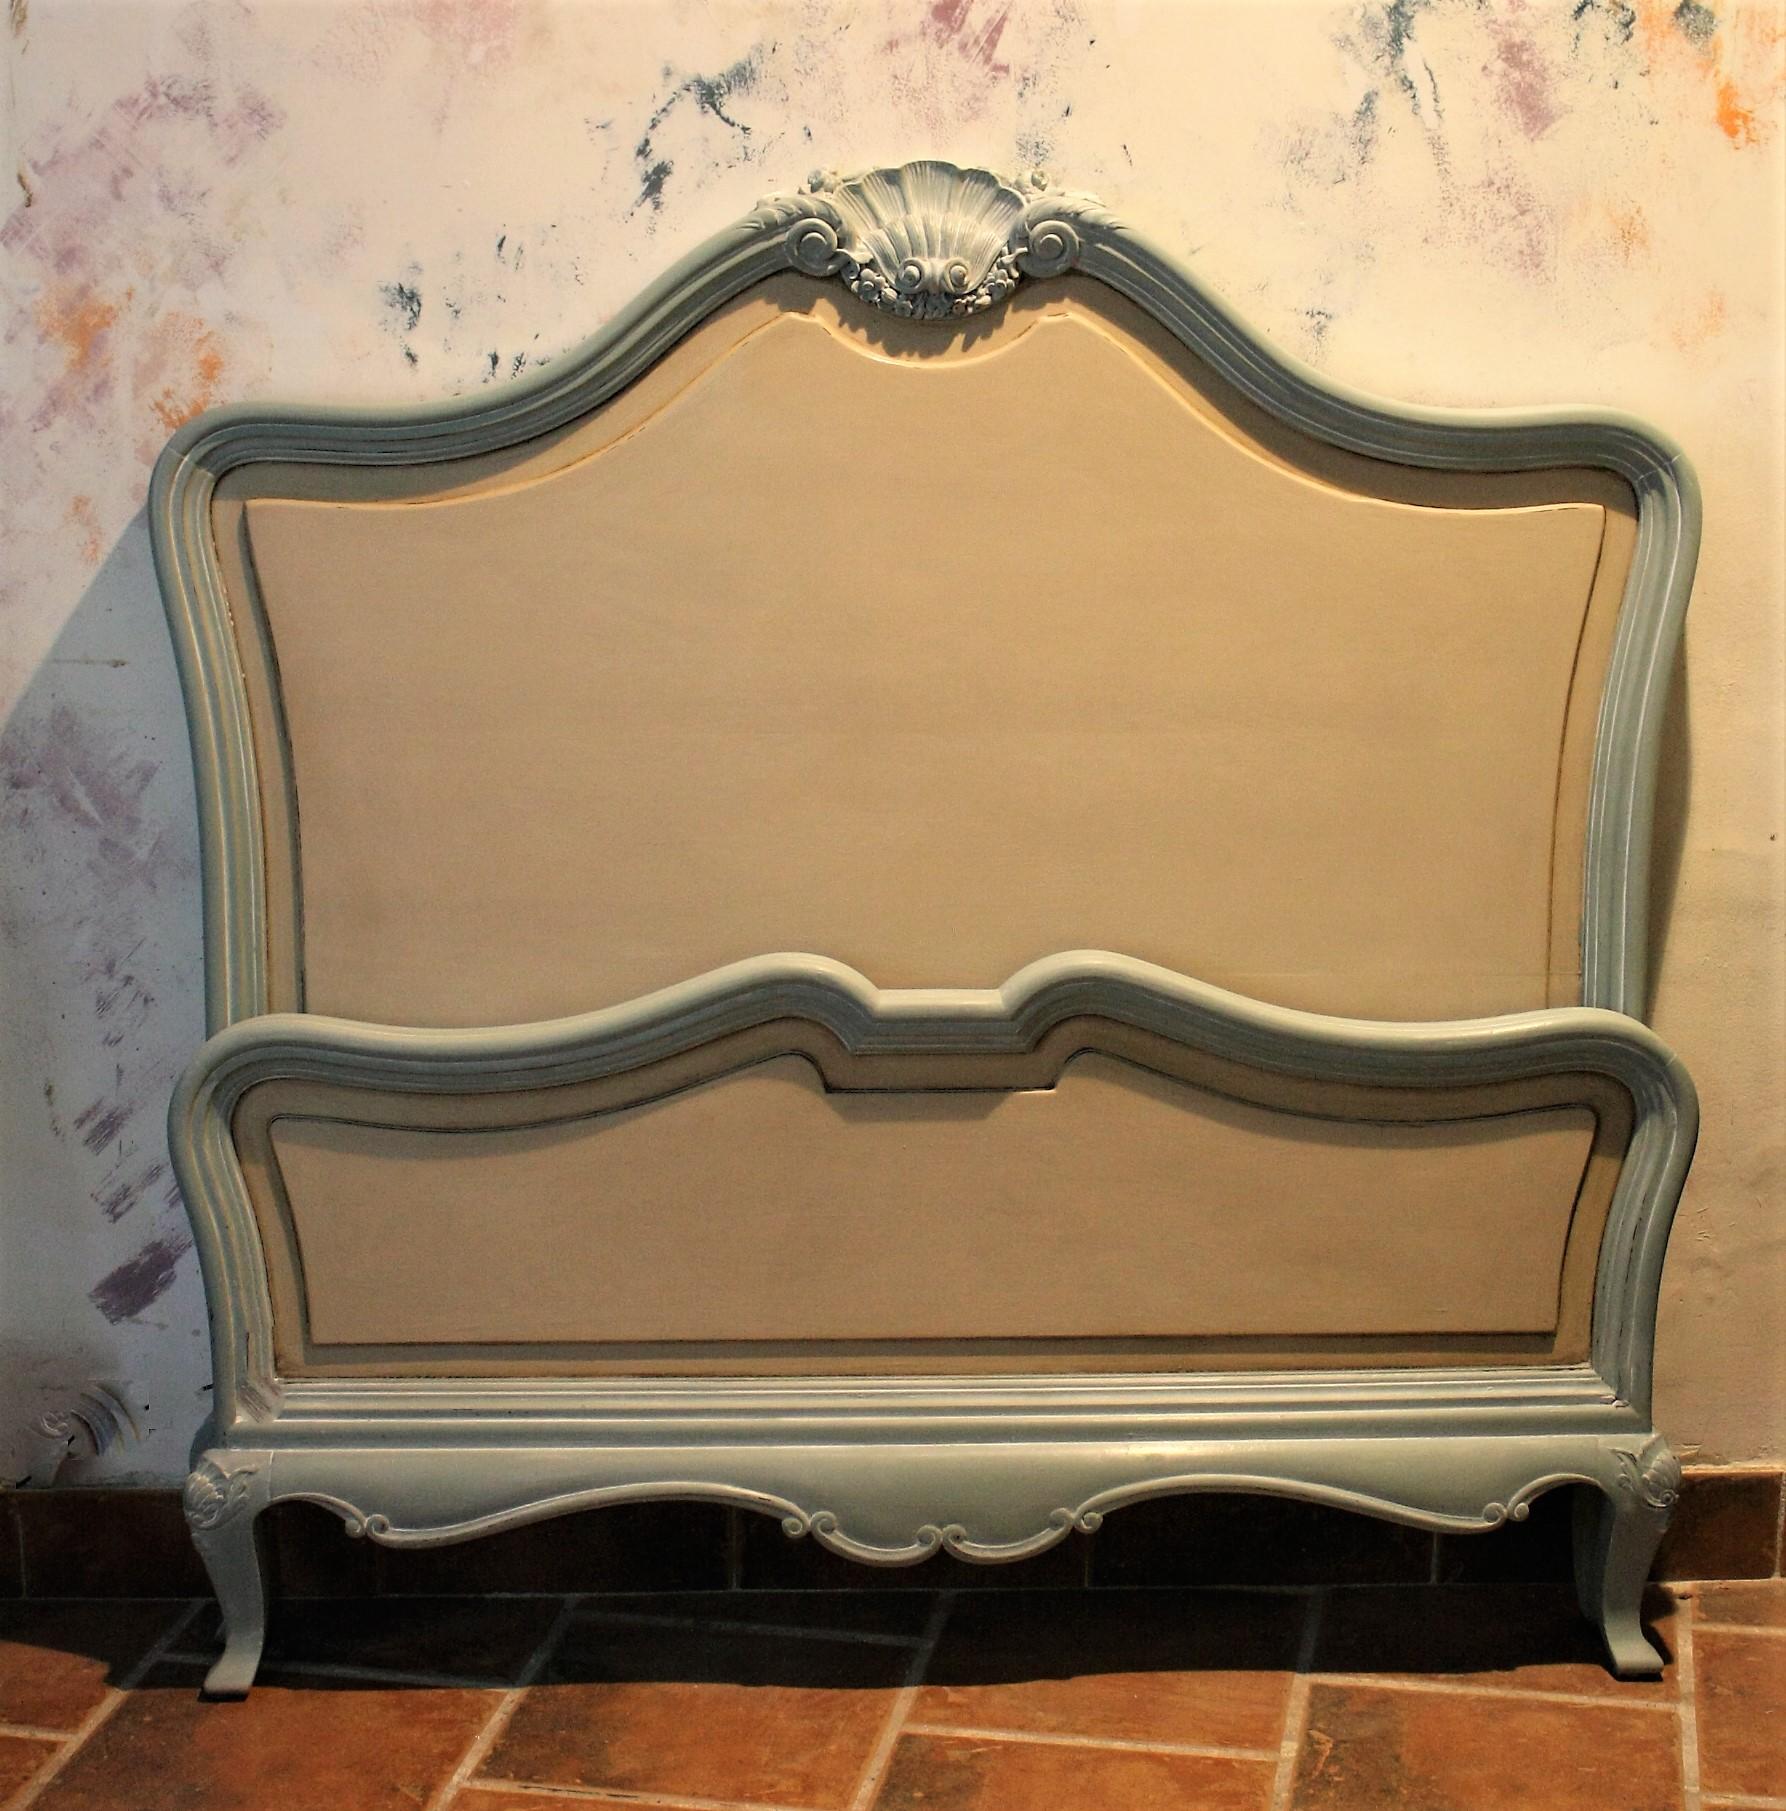 Cama pintada estilo Romántico